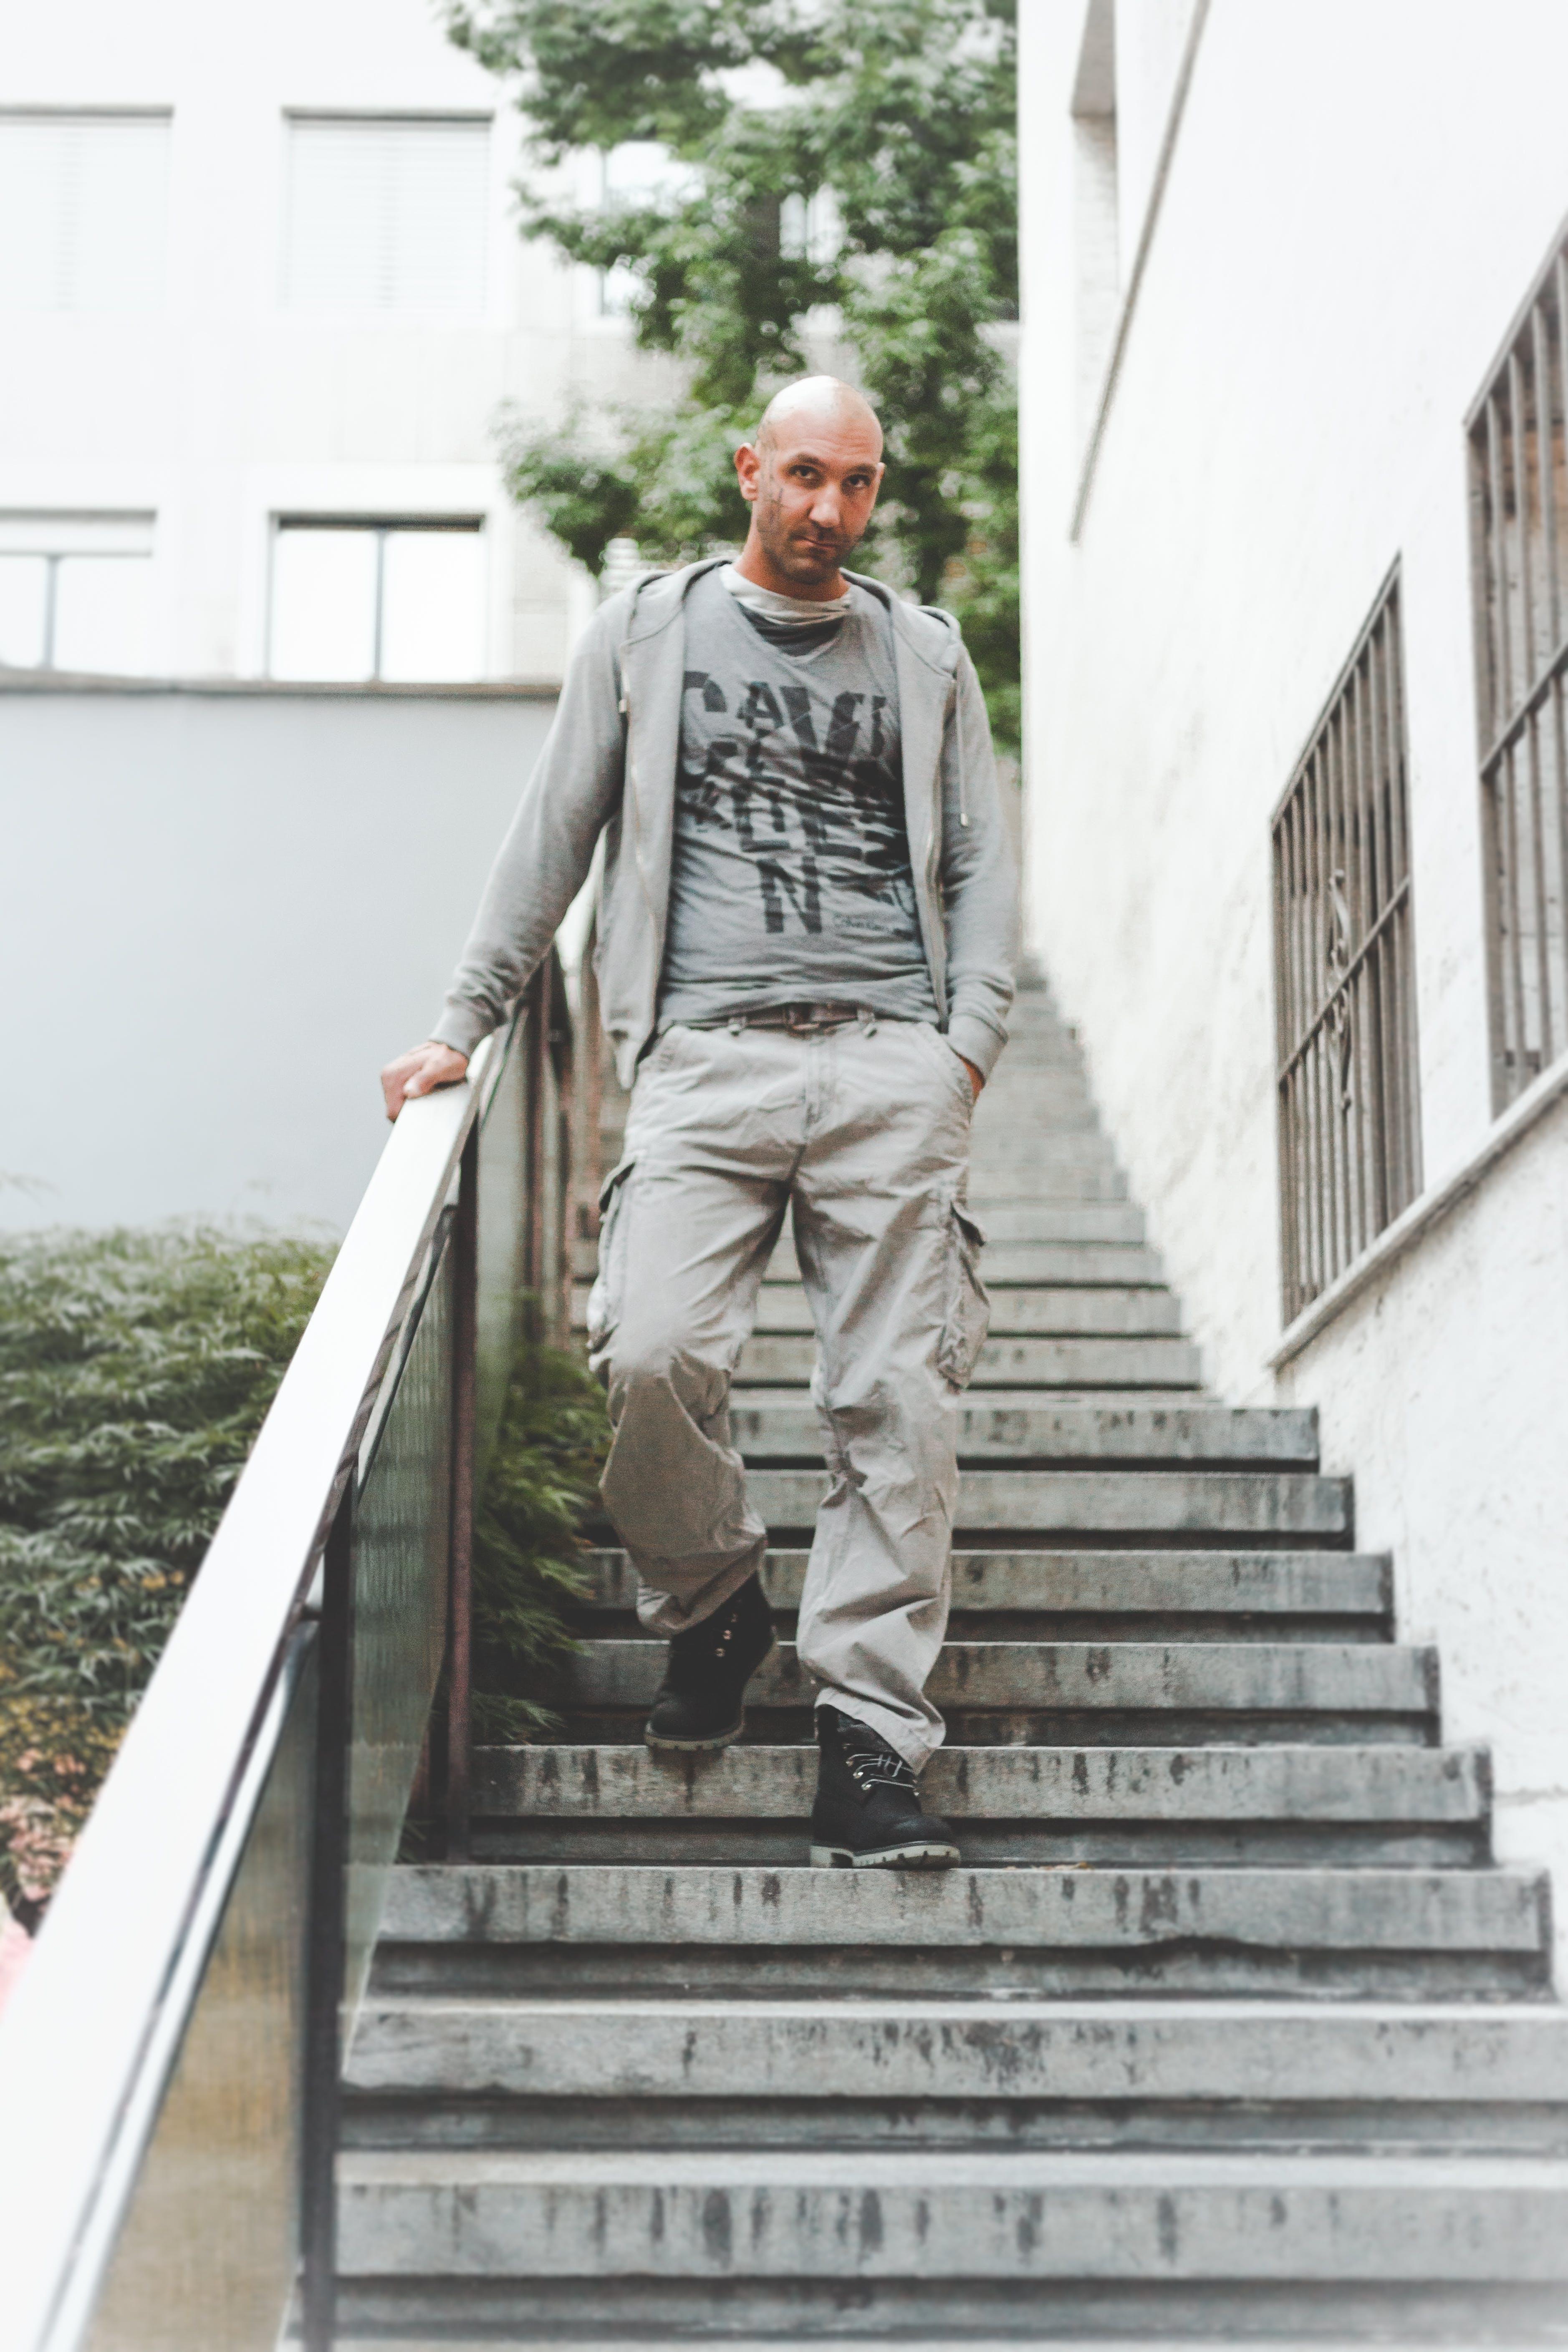 Man Wearing Gray Jacket Standing on Stair